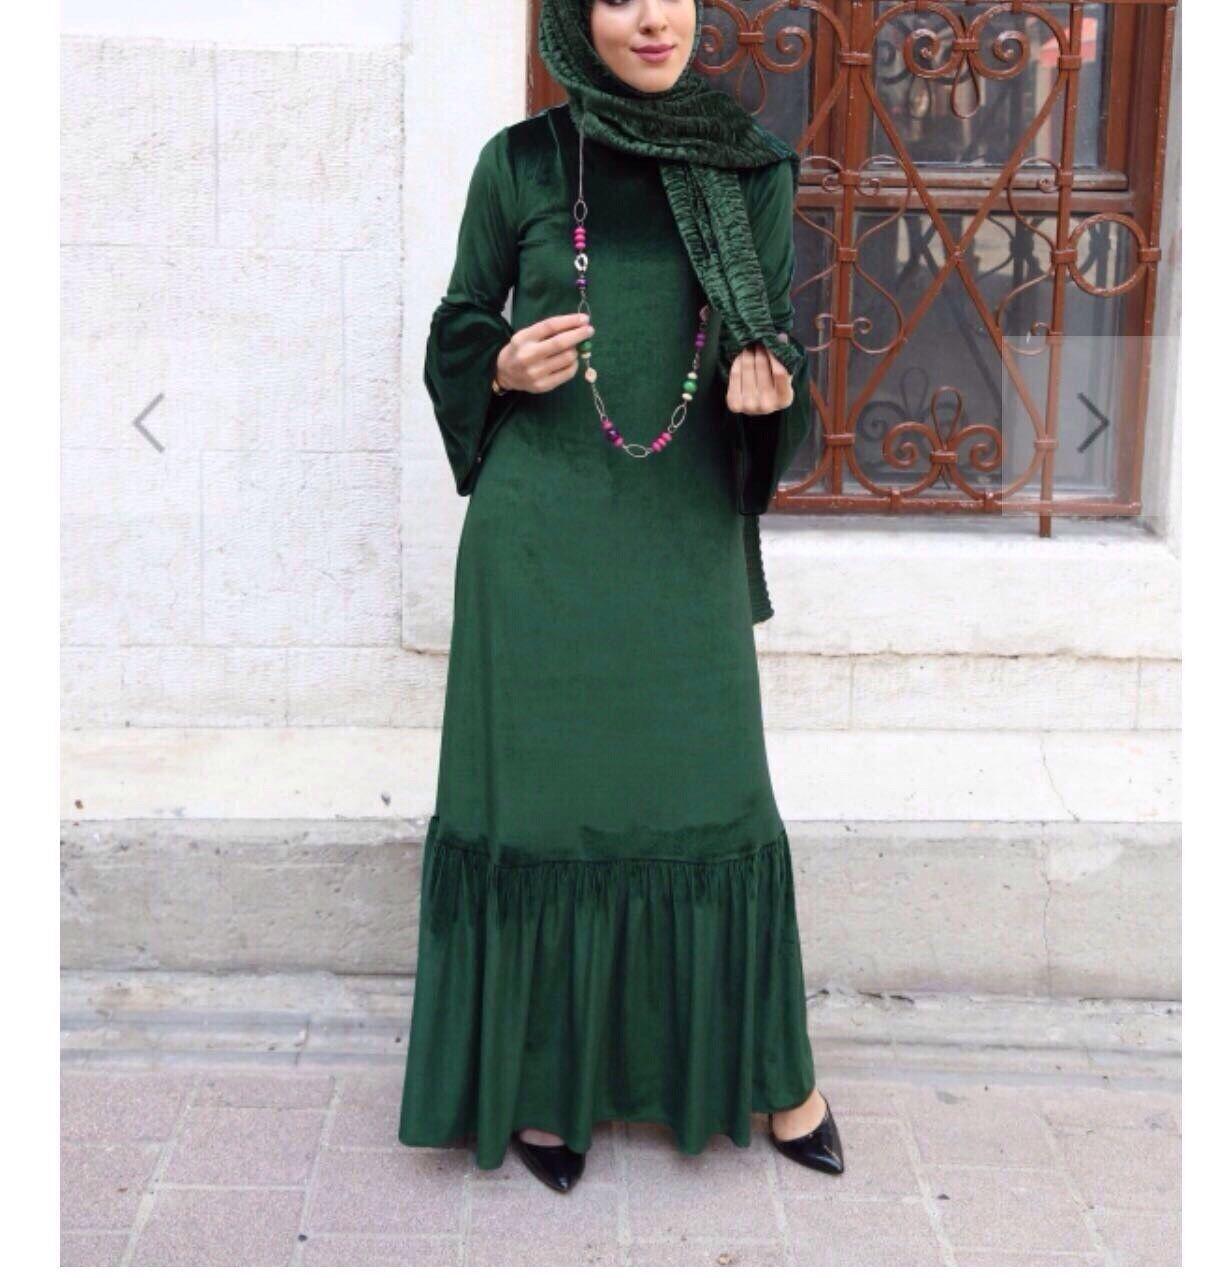 Modernes grünes Hijab Kleid Samt-kadife tesettür elbise (yeşil-mor) Kiyafet